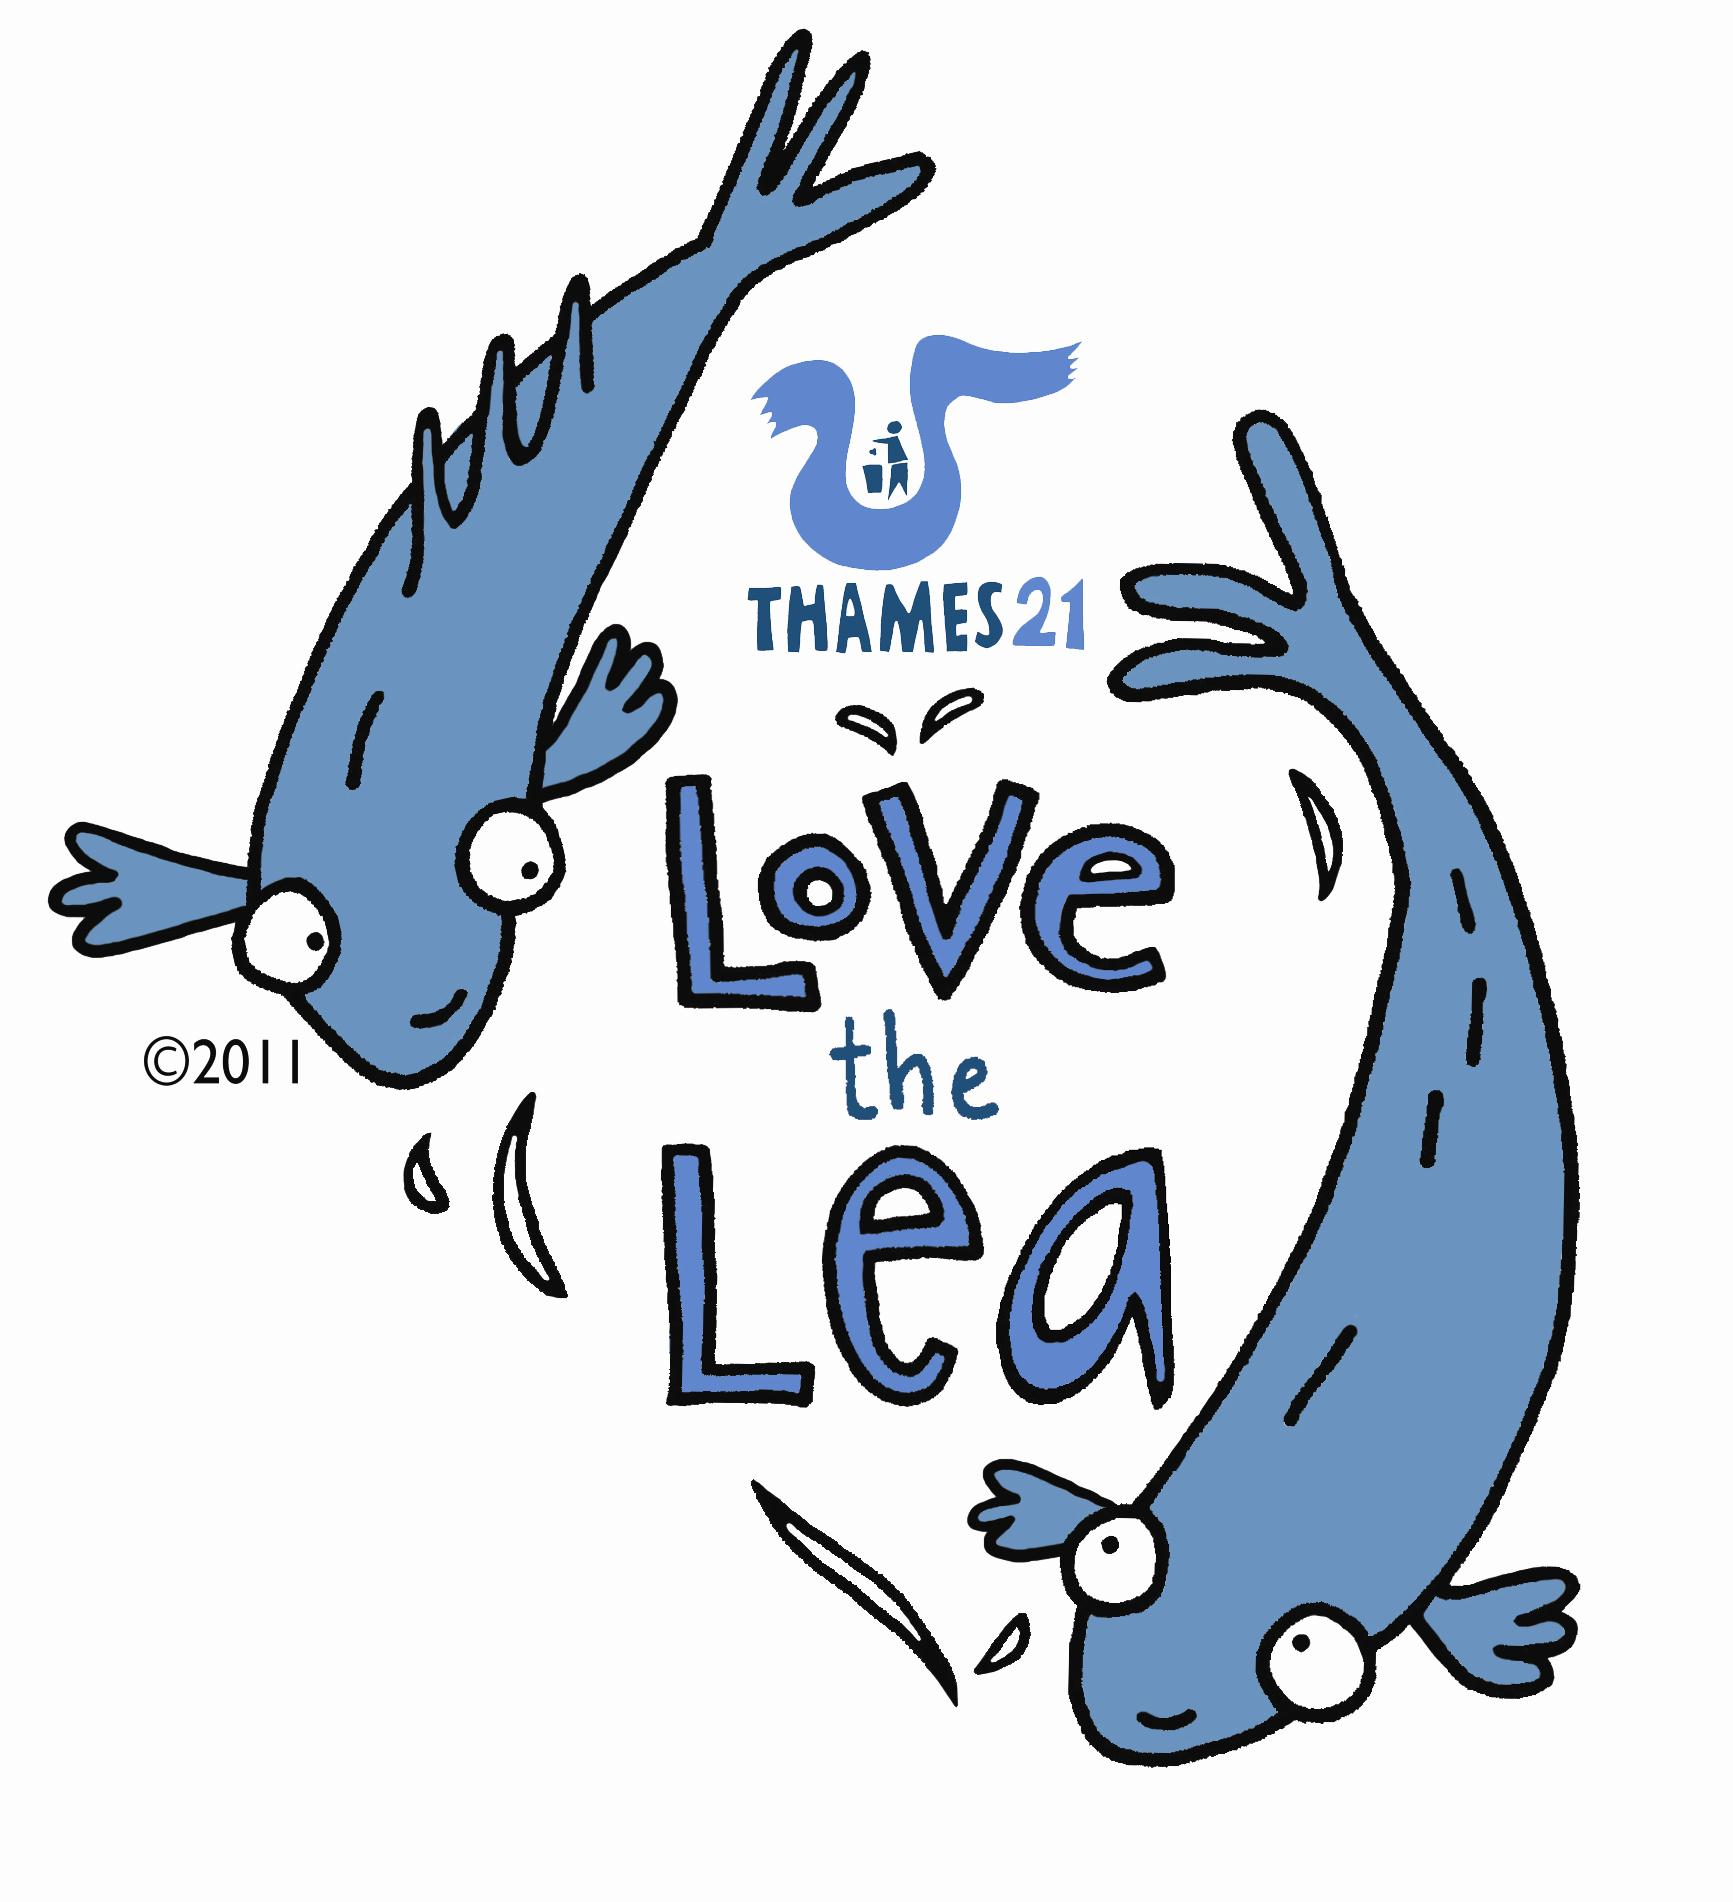 love the lea logo thames21